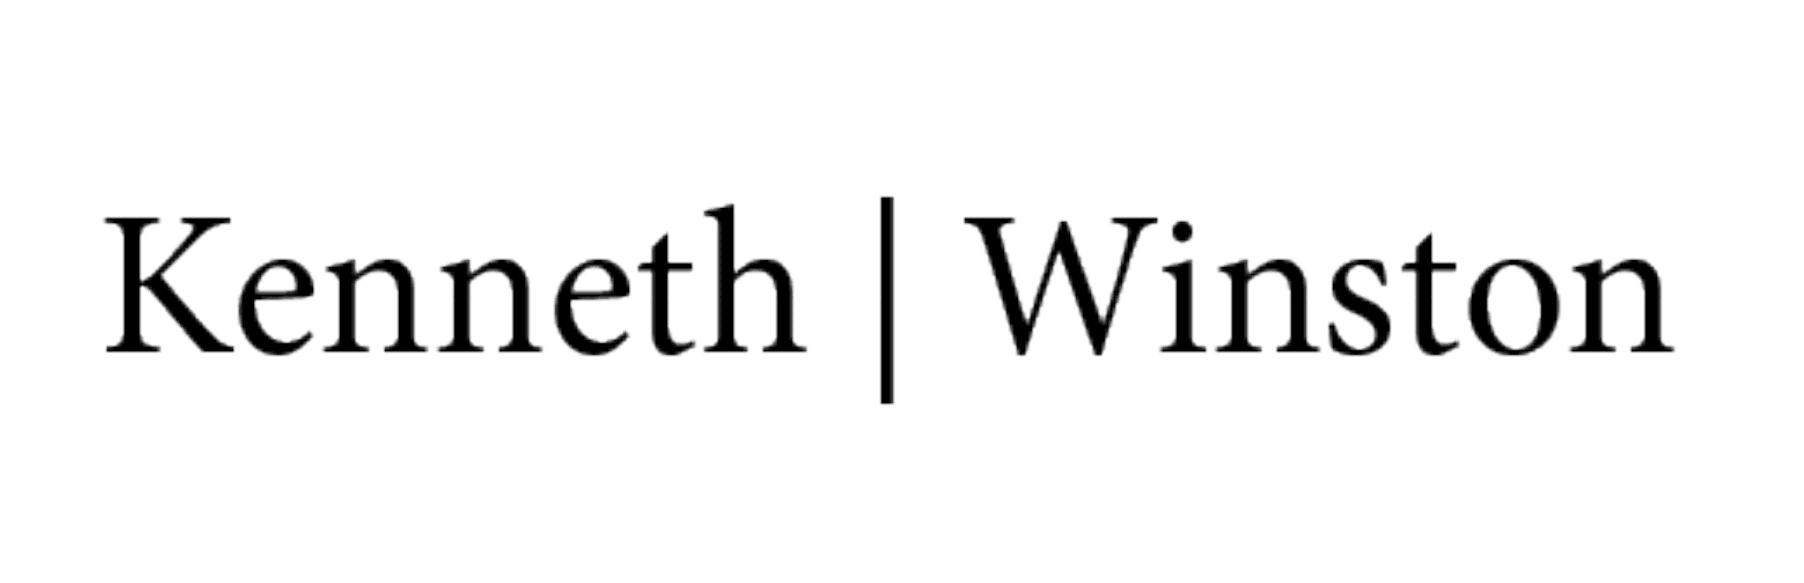 Kenneth Winston.jpg